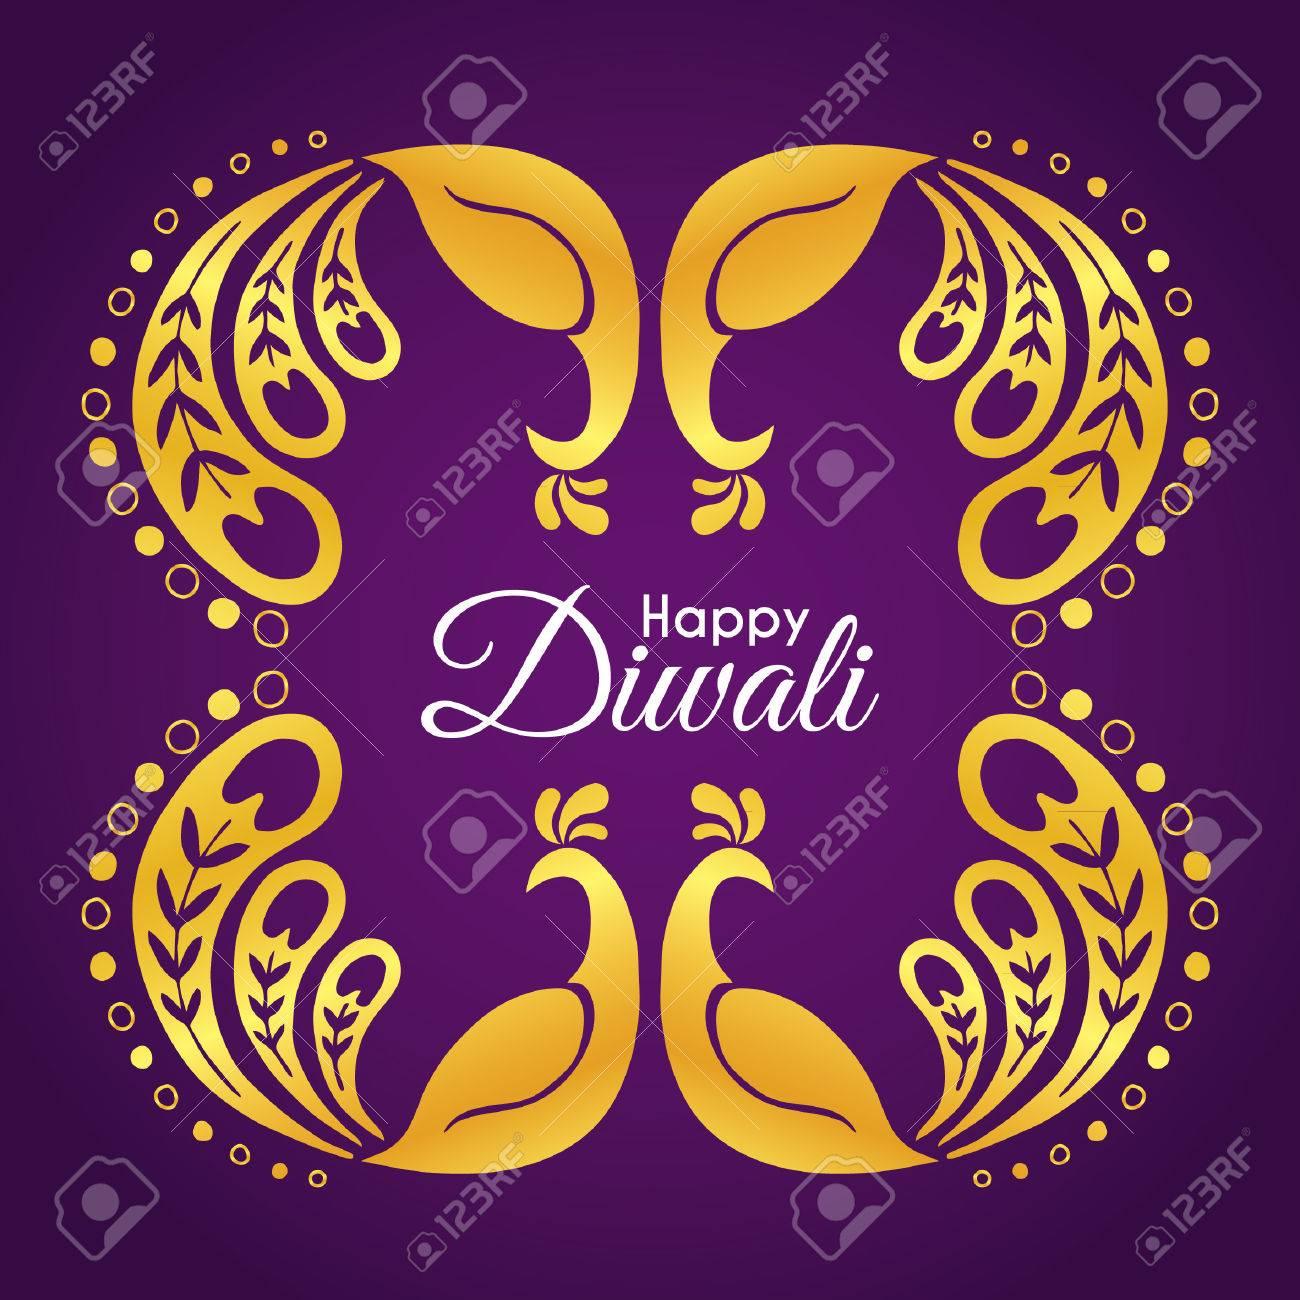 Diwali Deepavali Greetings Of Hand Drawn Golden Peacock Abstract